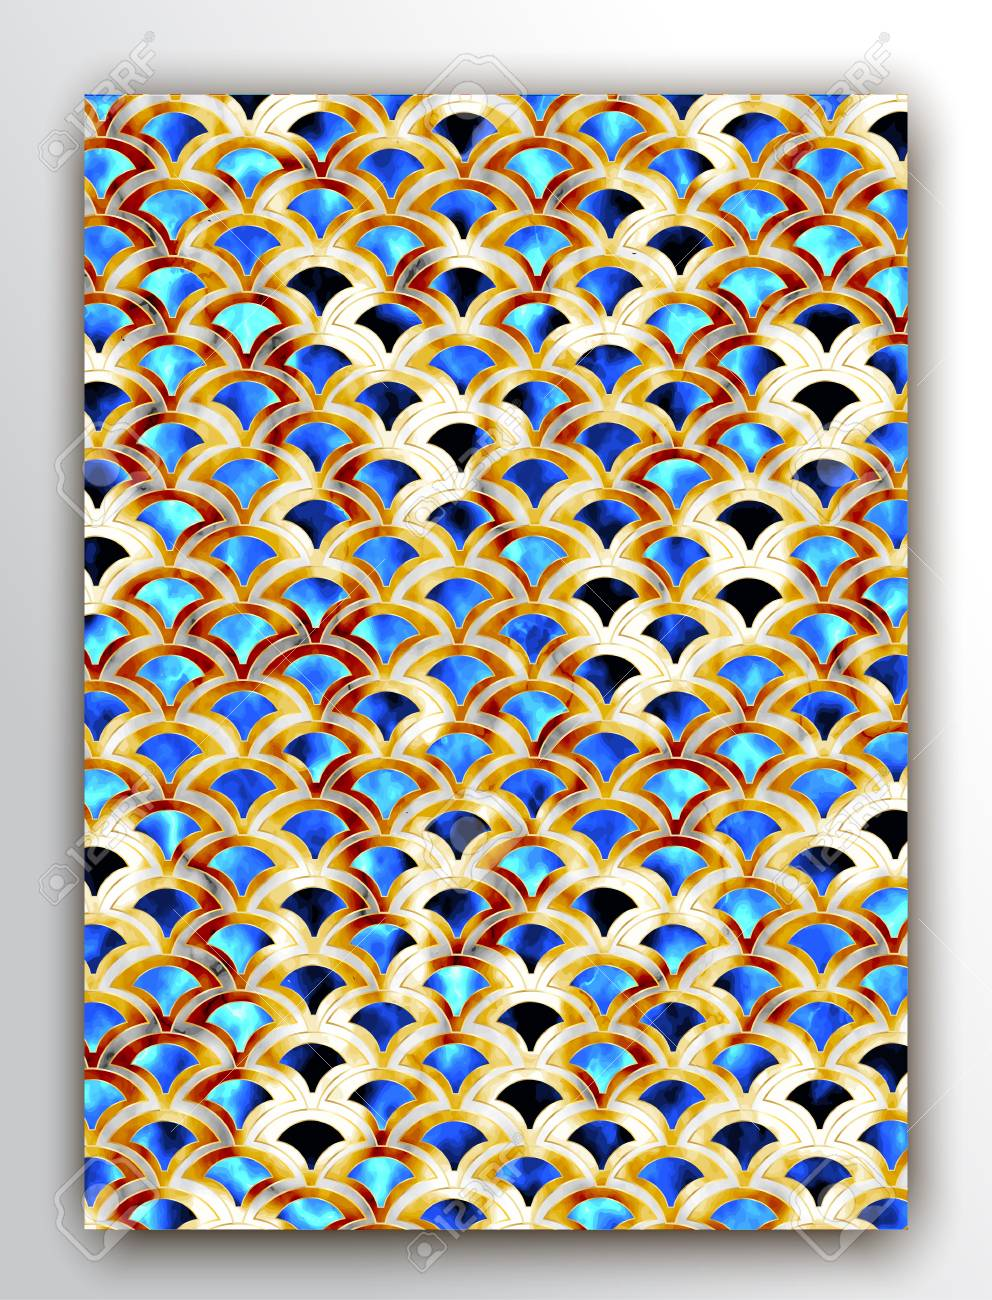 art deco pattern gold mermaid scales glitter geometric texture